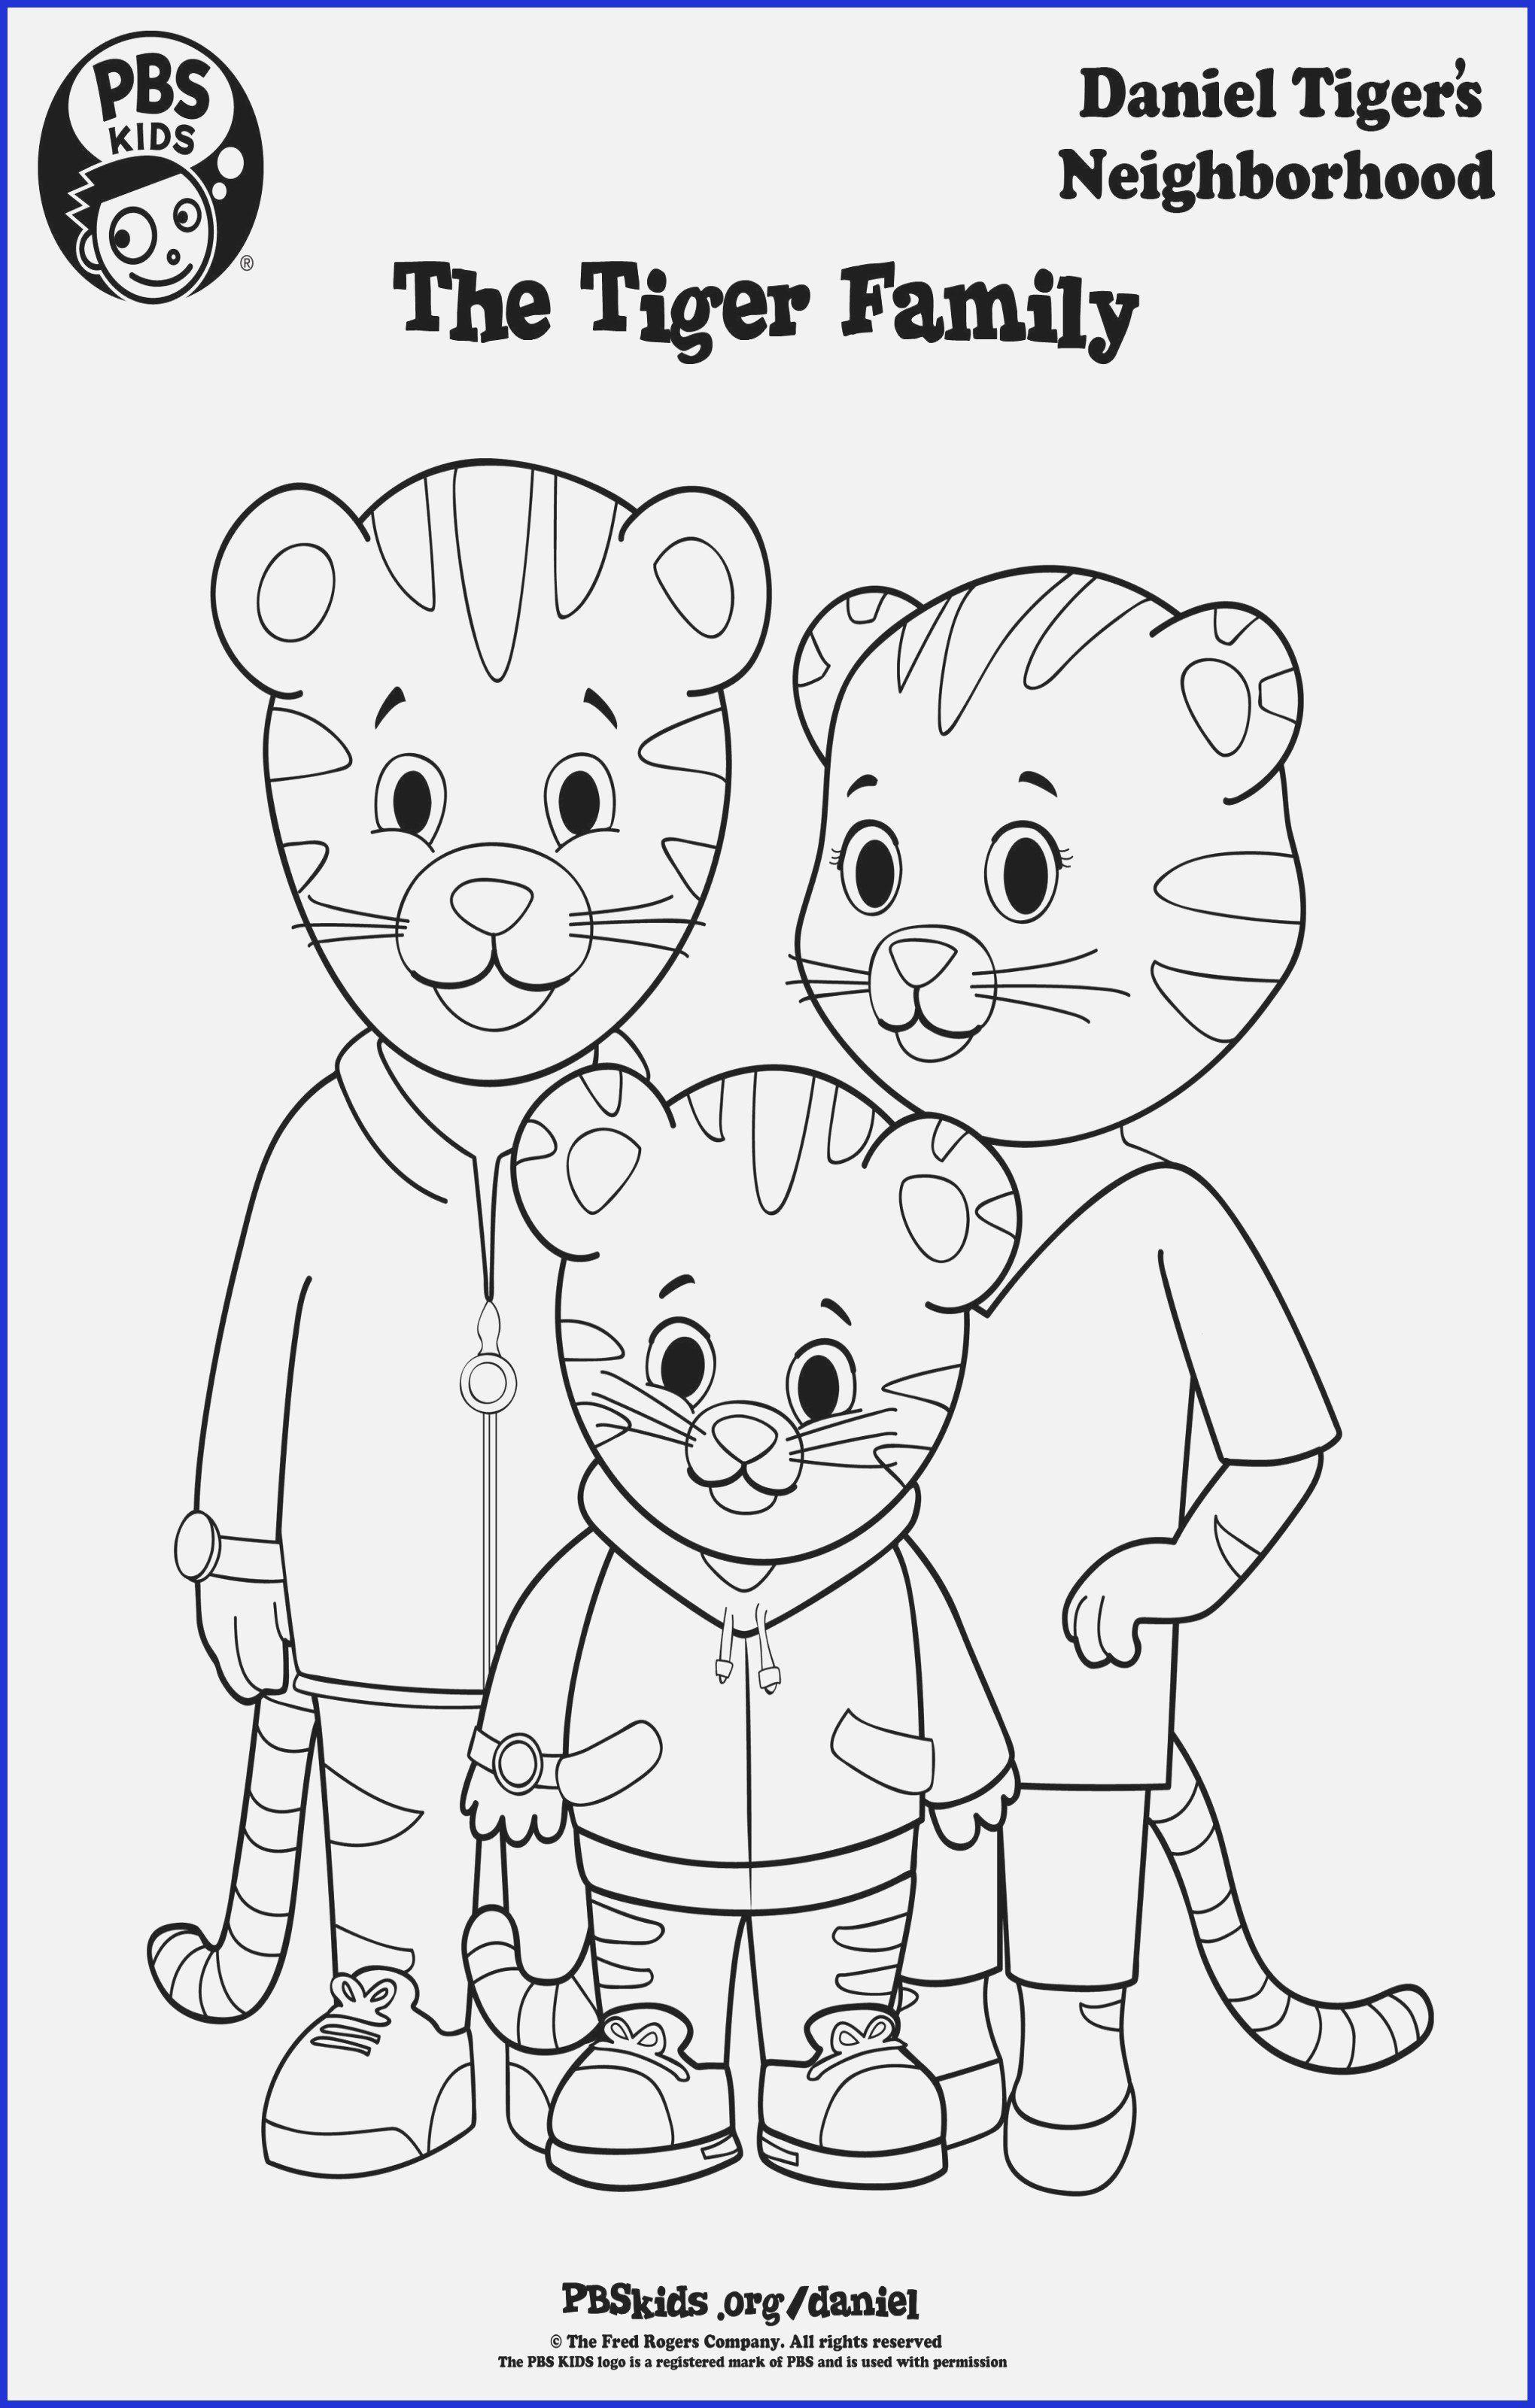 Daniel Tiger Coloring Pages Fresh Bubble Guppy Coloring Pages In 2020 Family Coloring Pages Halloween Coloring Pages Bubble Guppies Coloring Pages